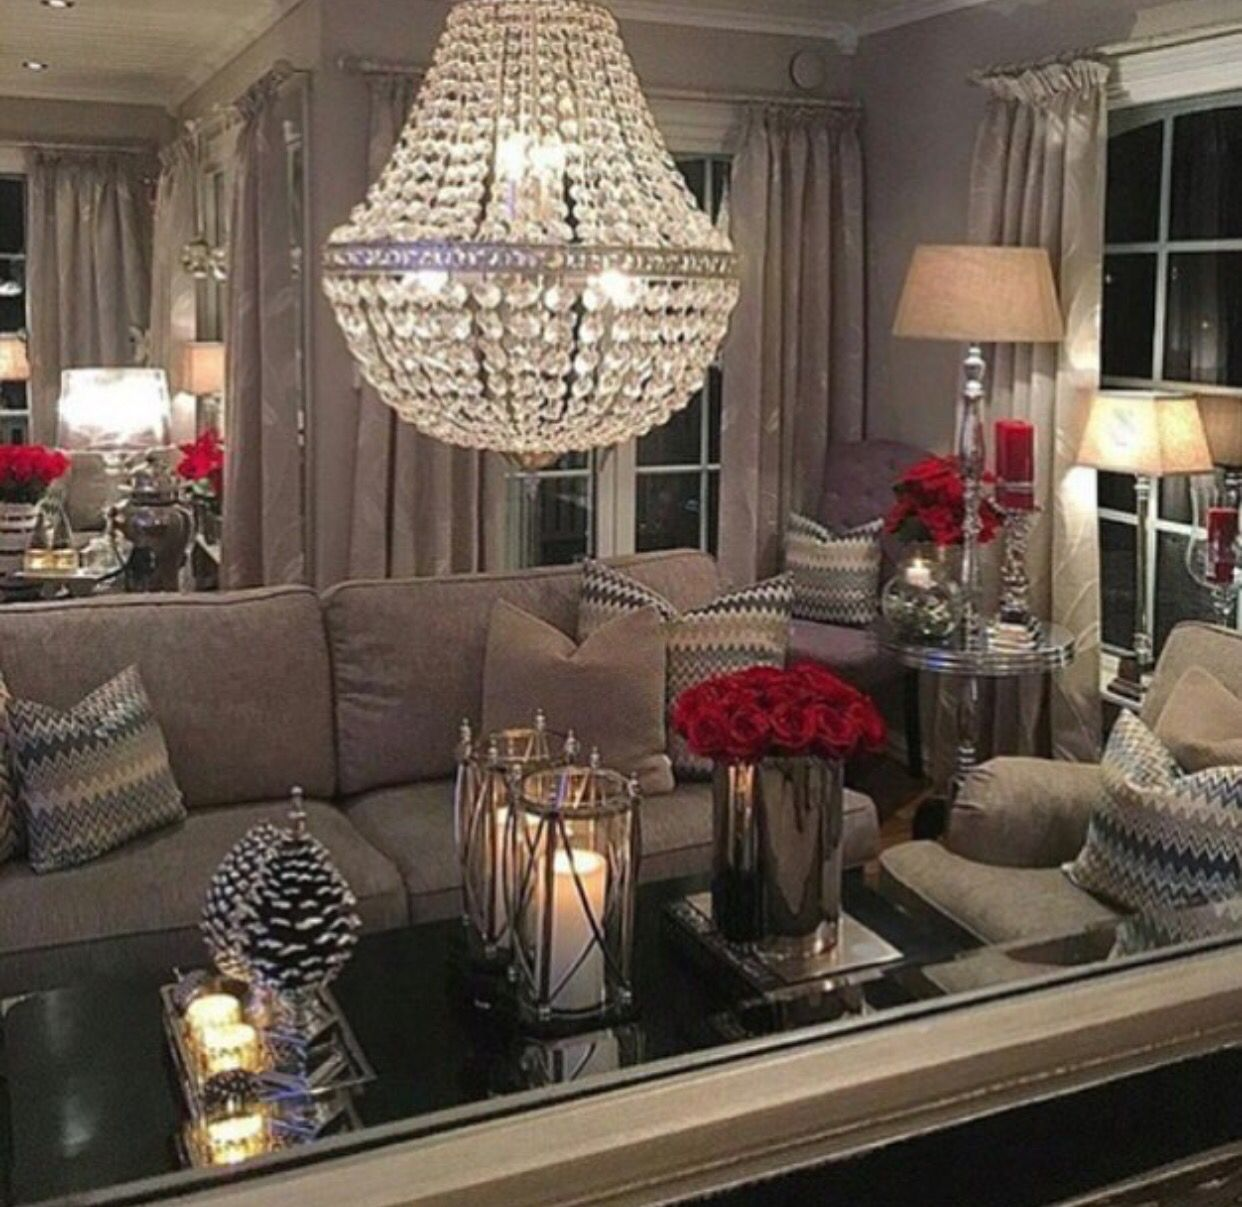 Living Room Decorating And Designs By Tina Barclay: 거실 아이디어, 인테리어, 거실